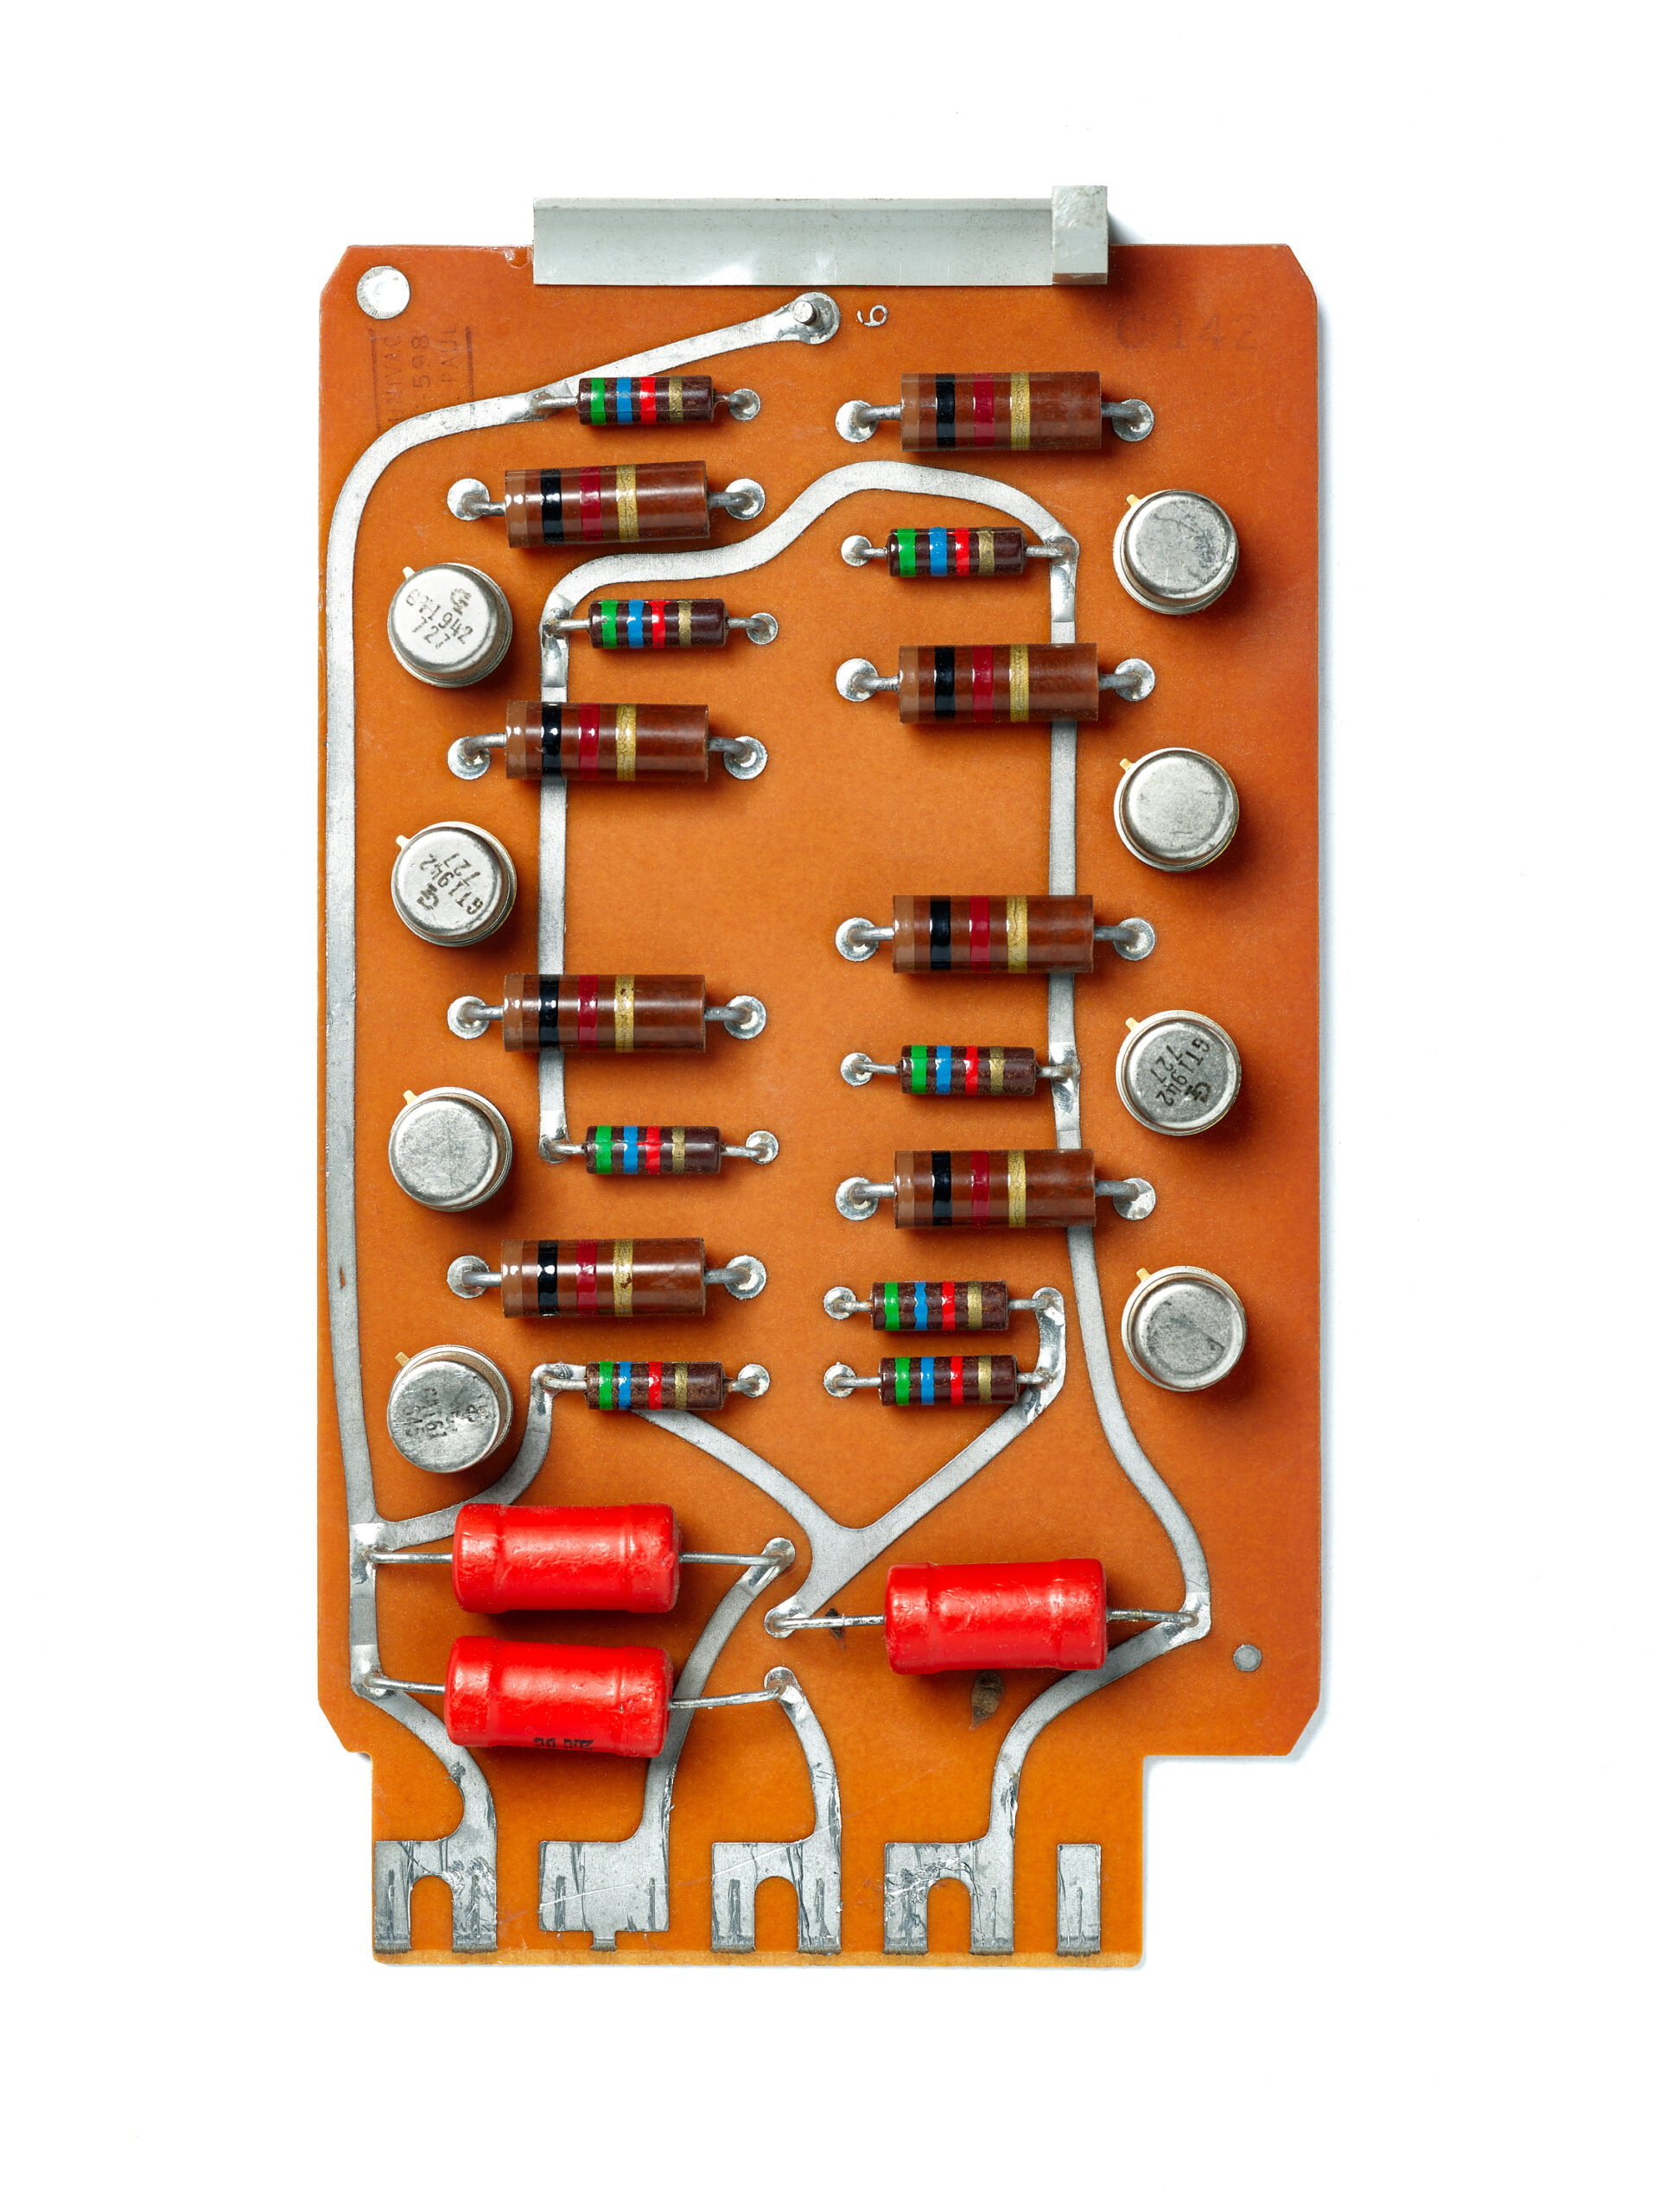 UNIVAC C-598 Card. circuit board, computer, mainframe, tech history, transistors, vintage computing.